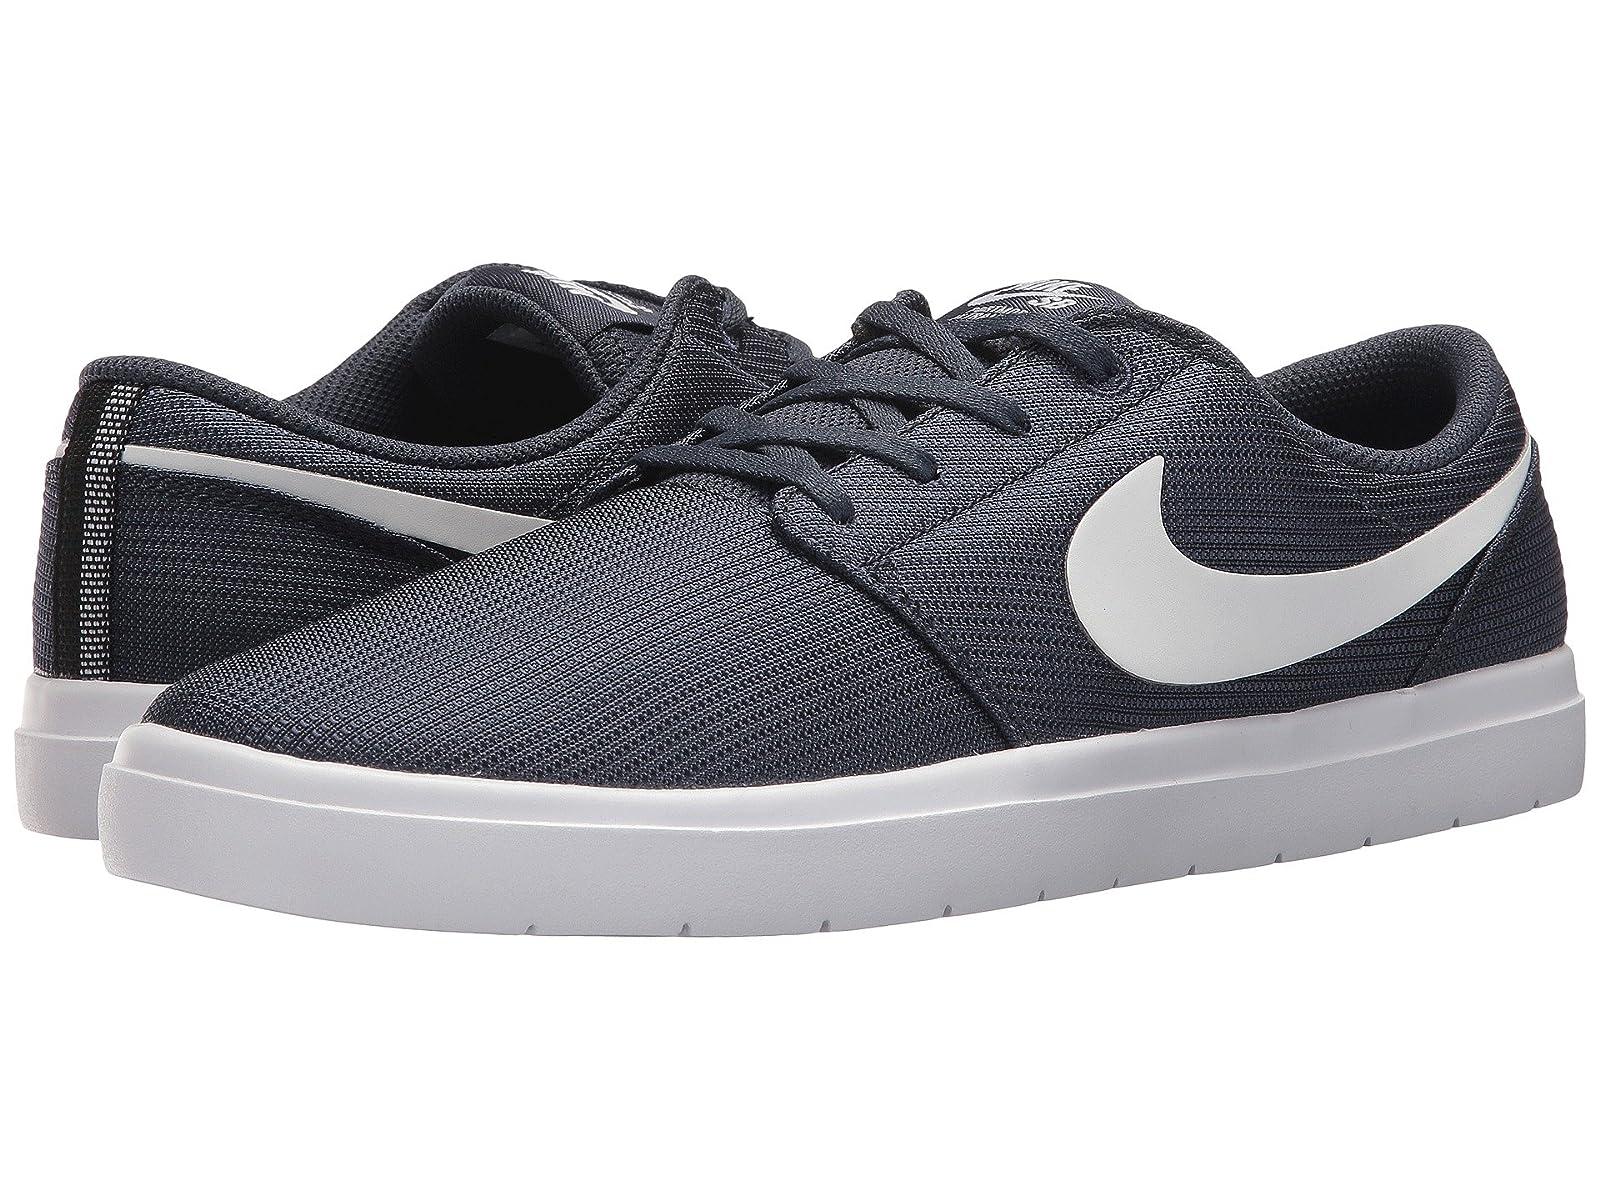 Nike SB Portmore II UltralightAtmospheric grades have affordable shoes